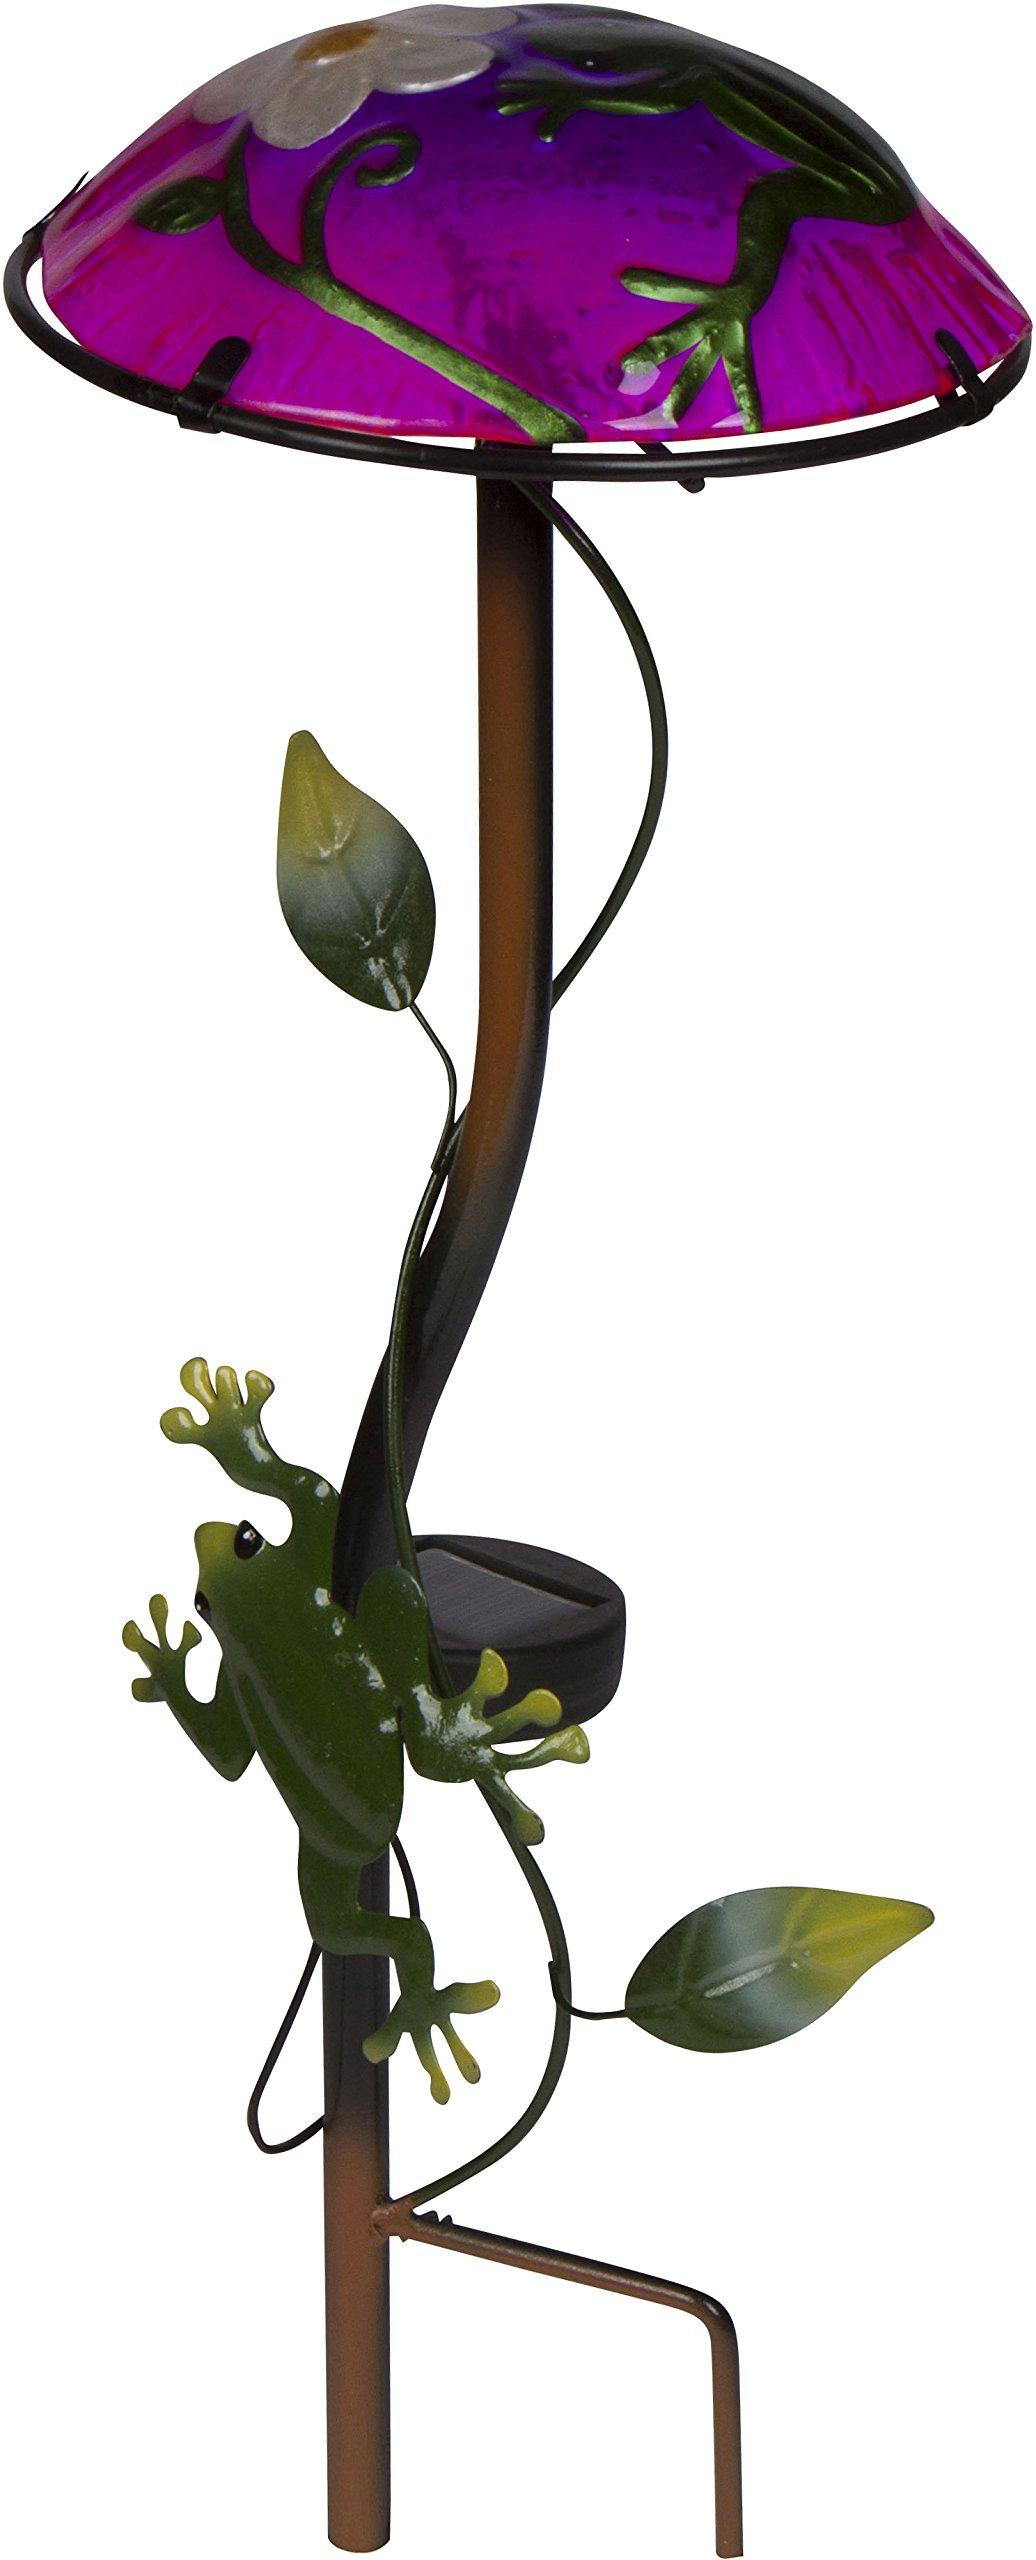 12'' Solar Mushroom Garden Stake with Frog Design by Trademark Innovations (Light Green) by Trademark Innovations (Image #2)